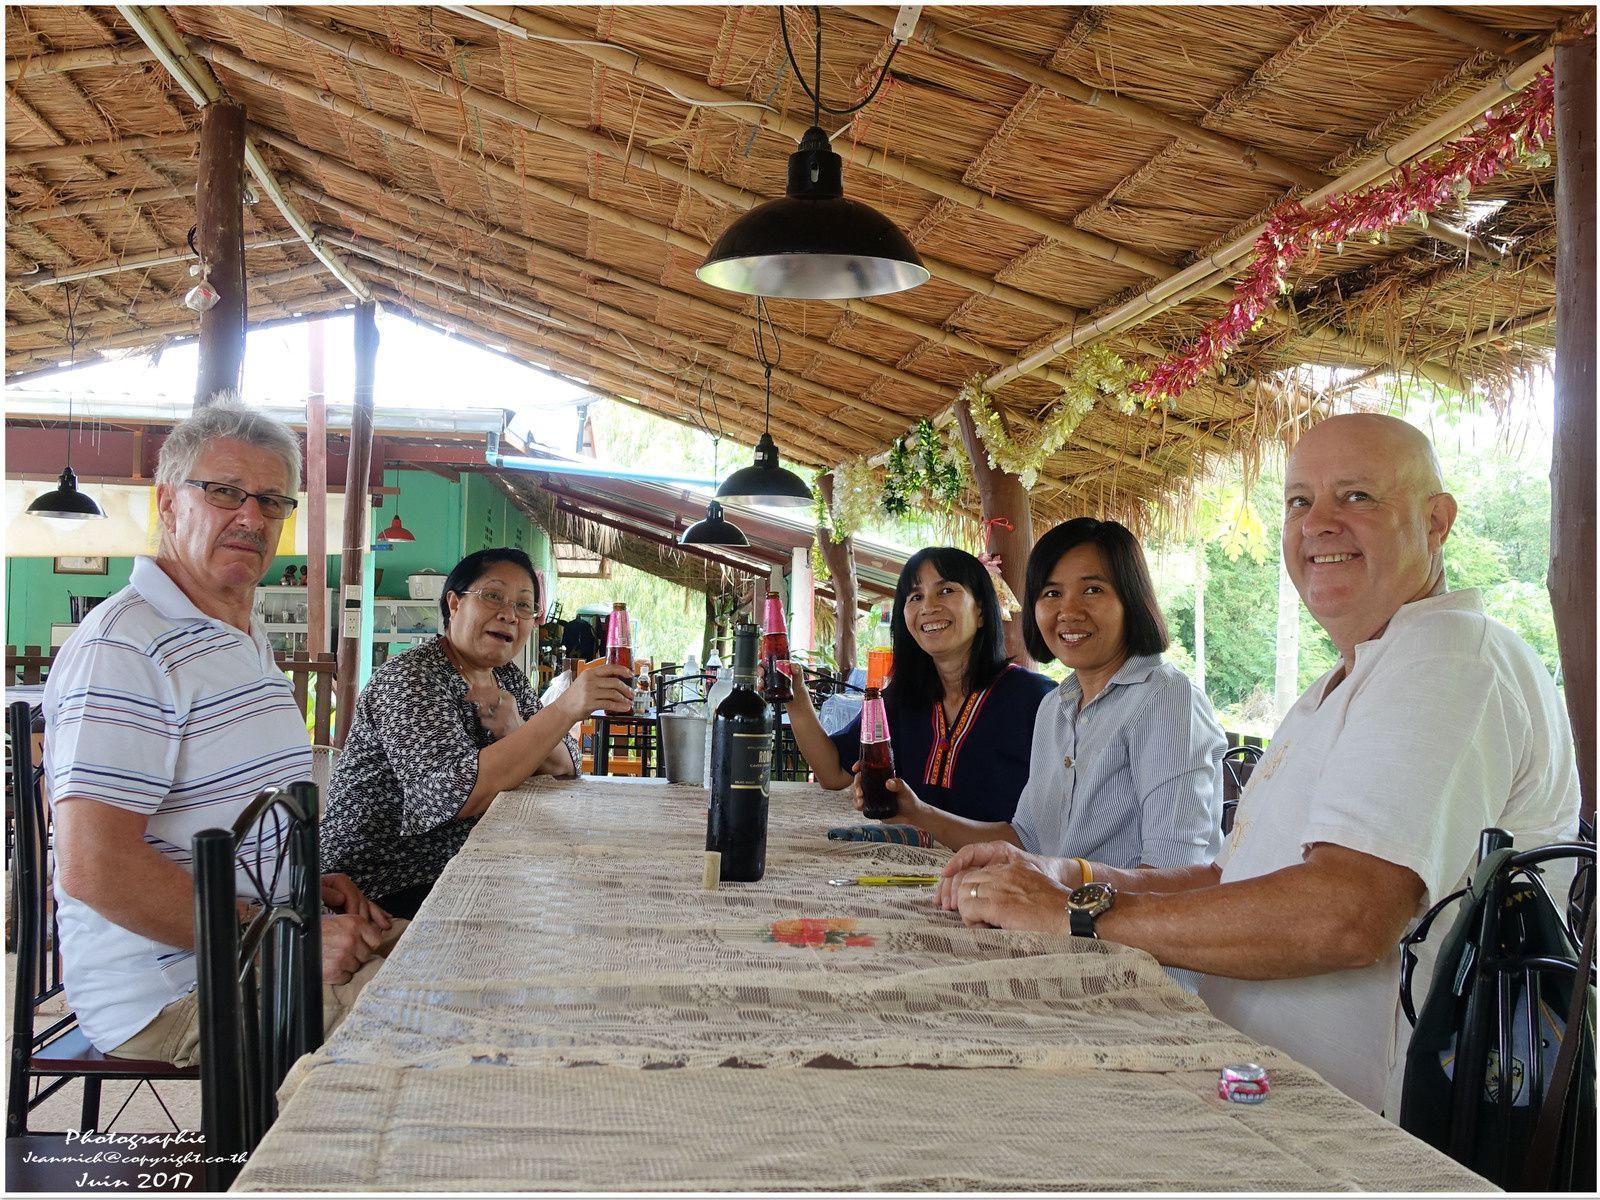 Un restaurant Suisso-Thaï à Ubolratana (Thaïlande, Isaan)